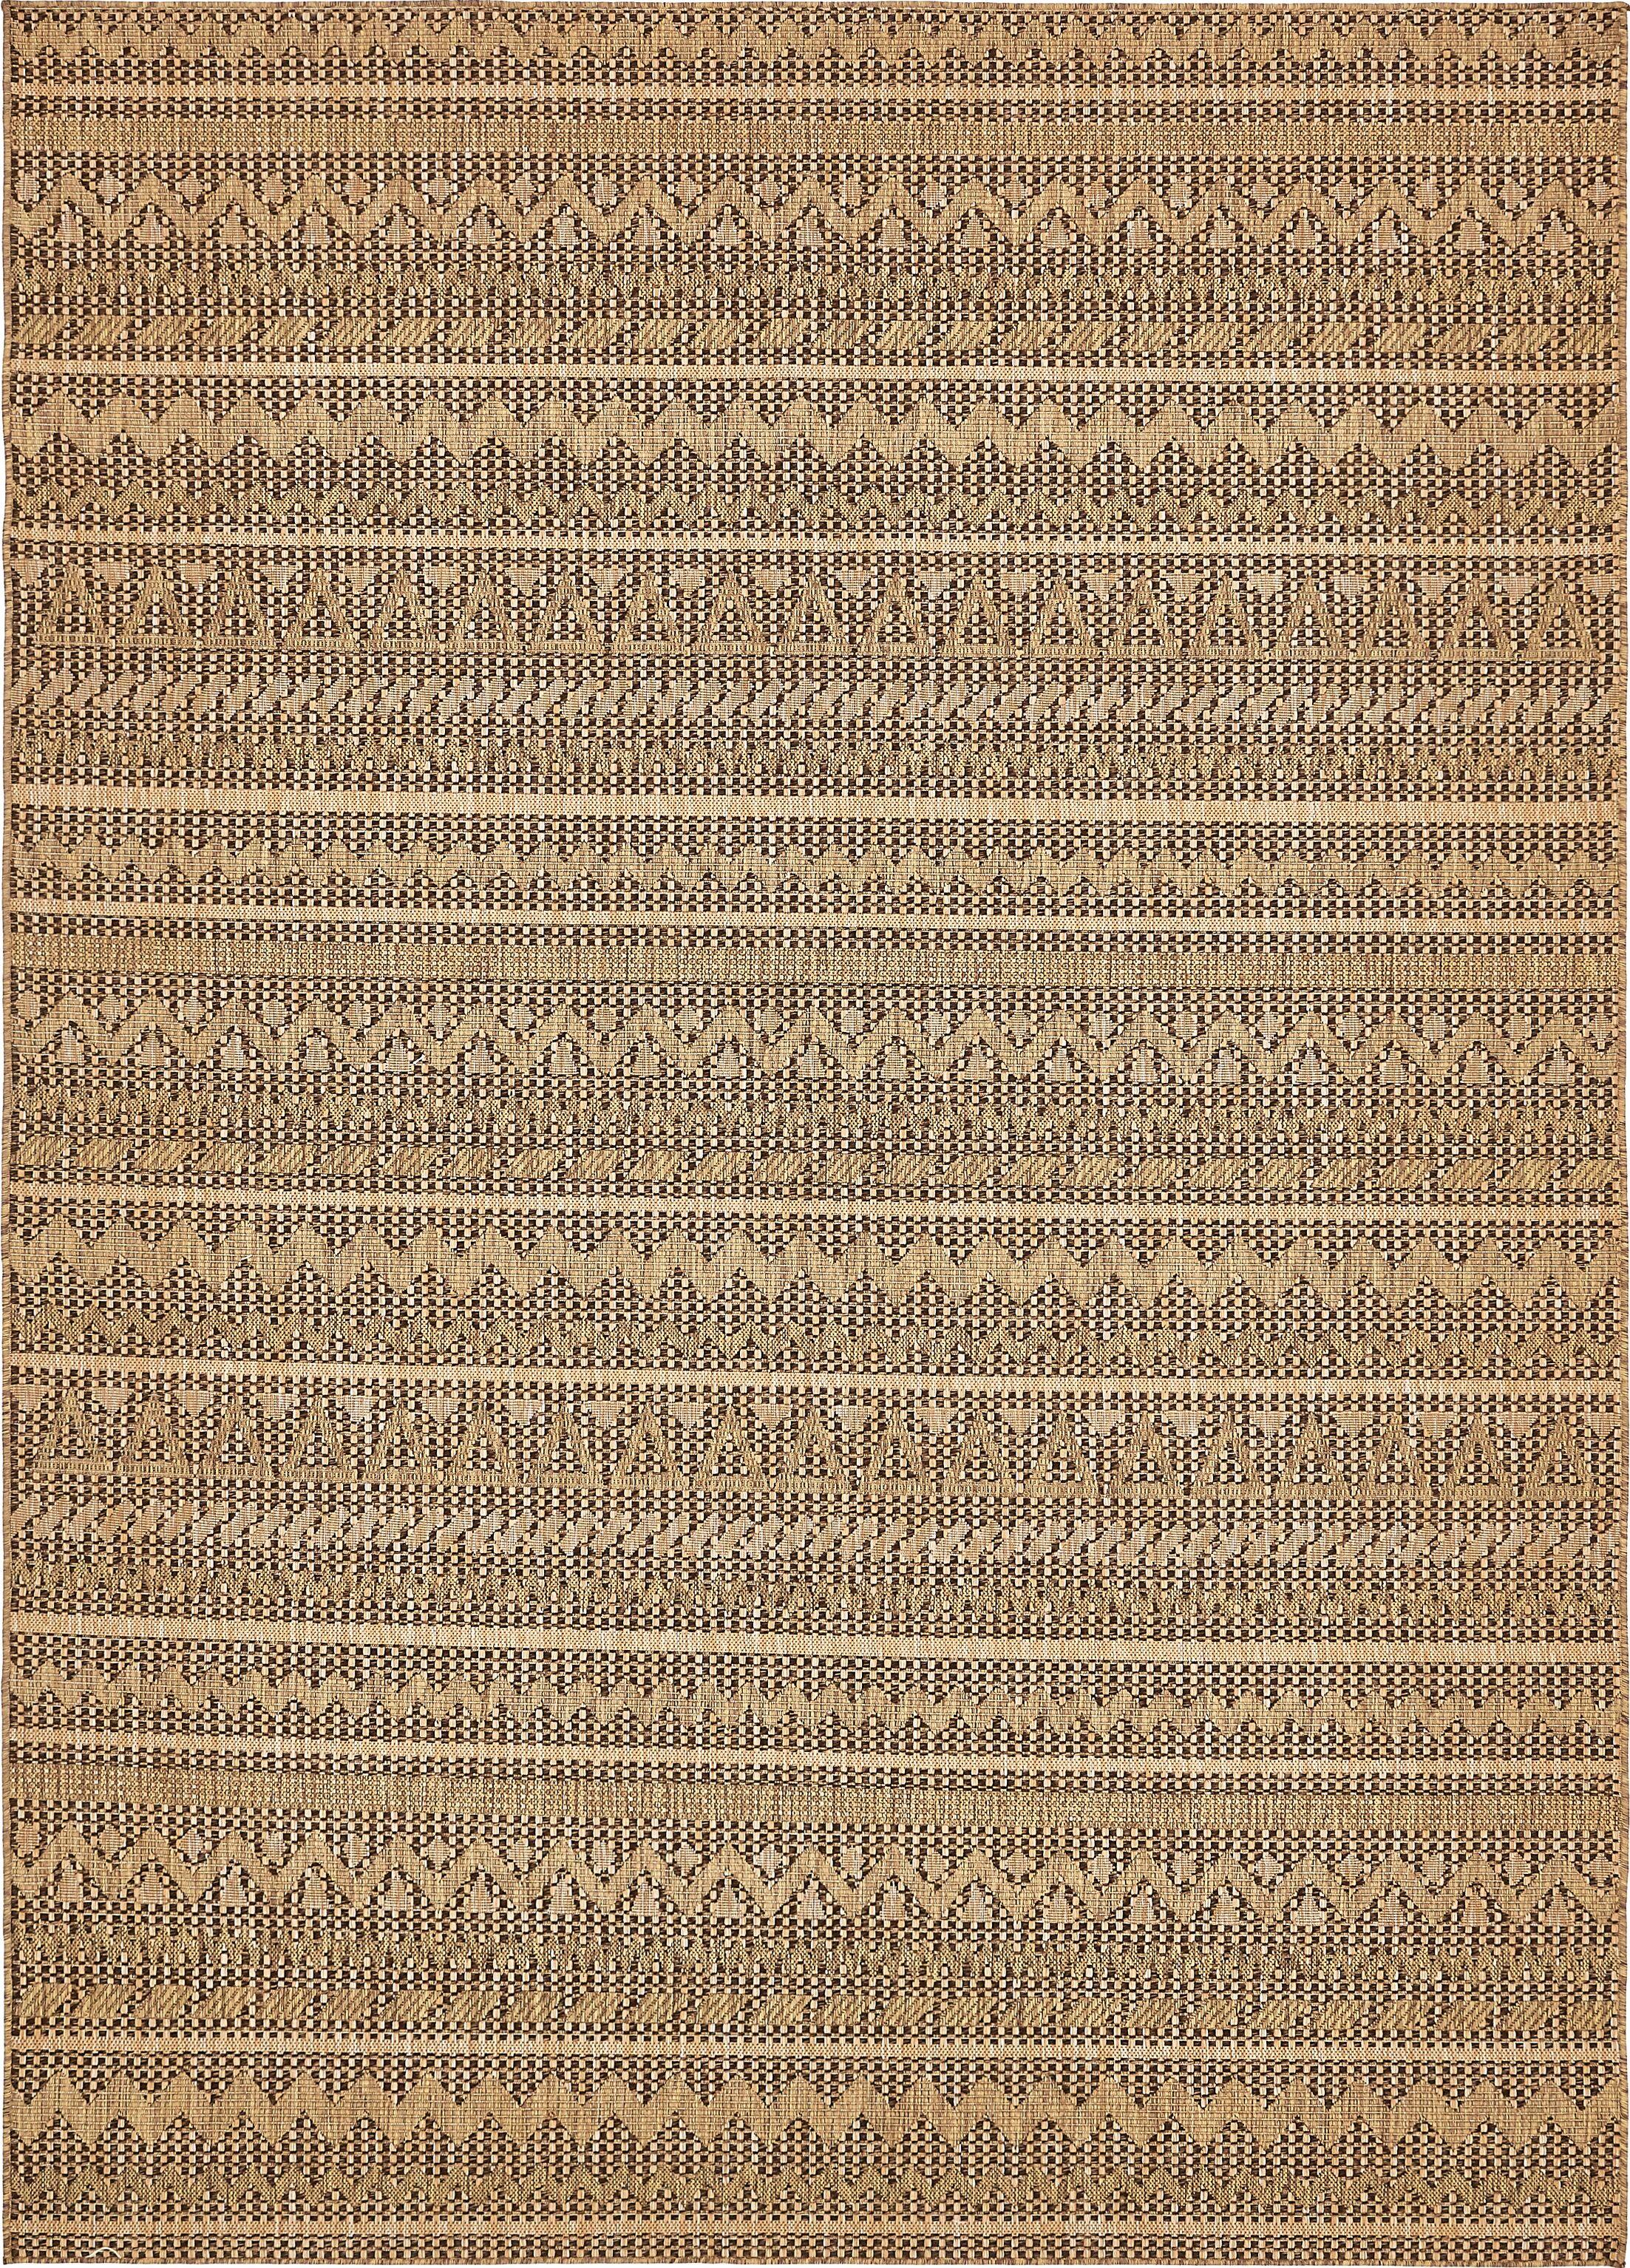 Krystal Light Brown Outdoor Area Rug Rug Size: Rectangle 8' x 11'4